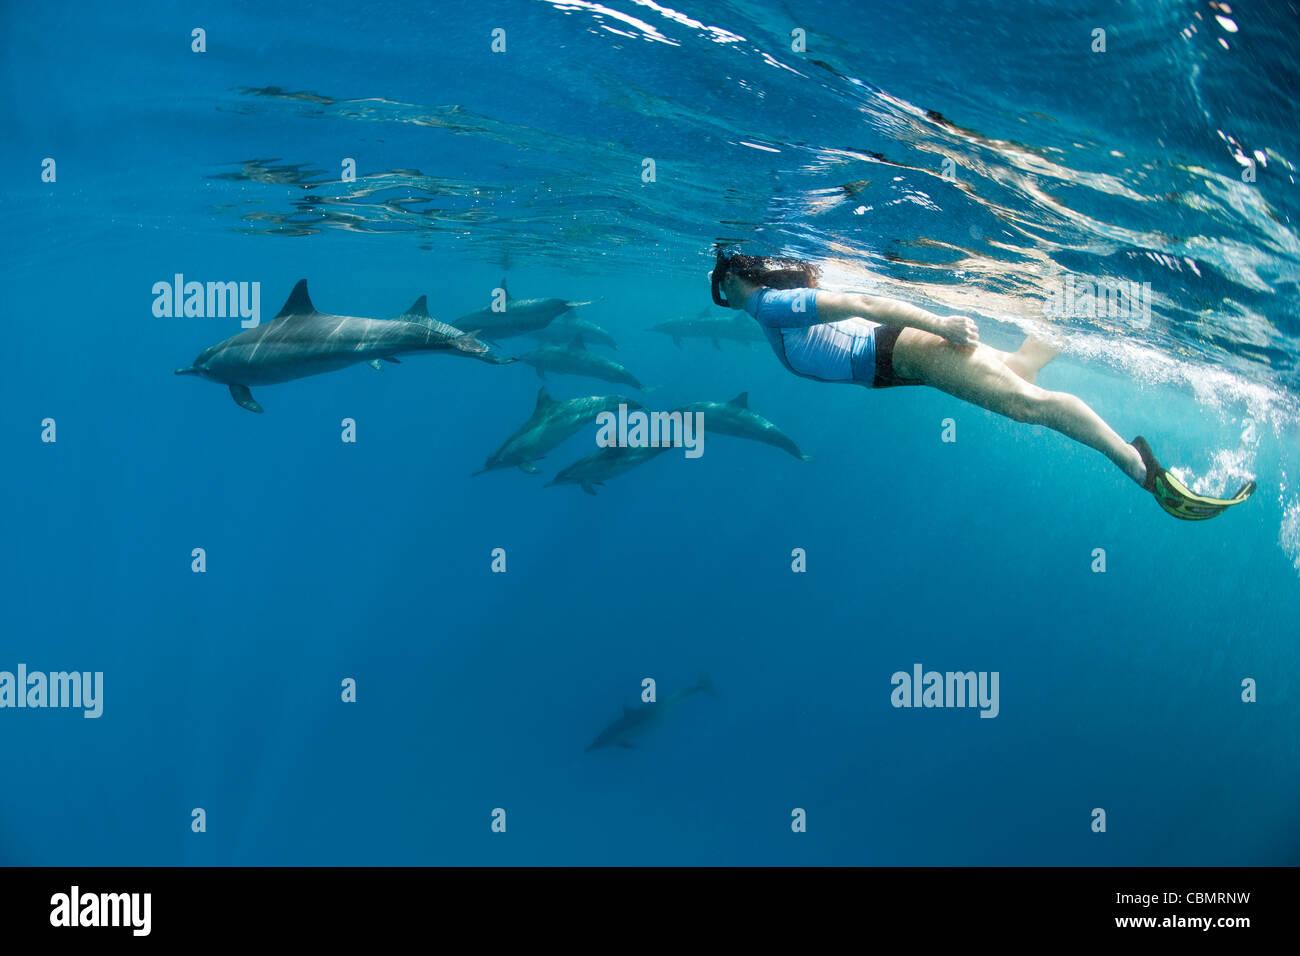 Plongée avec les dauphins, Stenella longirostris, Shaab Rumi, Mer Rouge, au Soudan Photo Stock